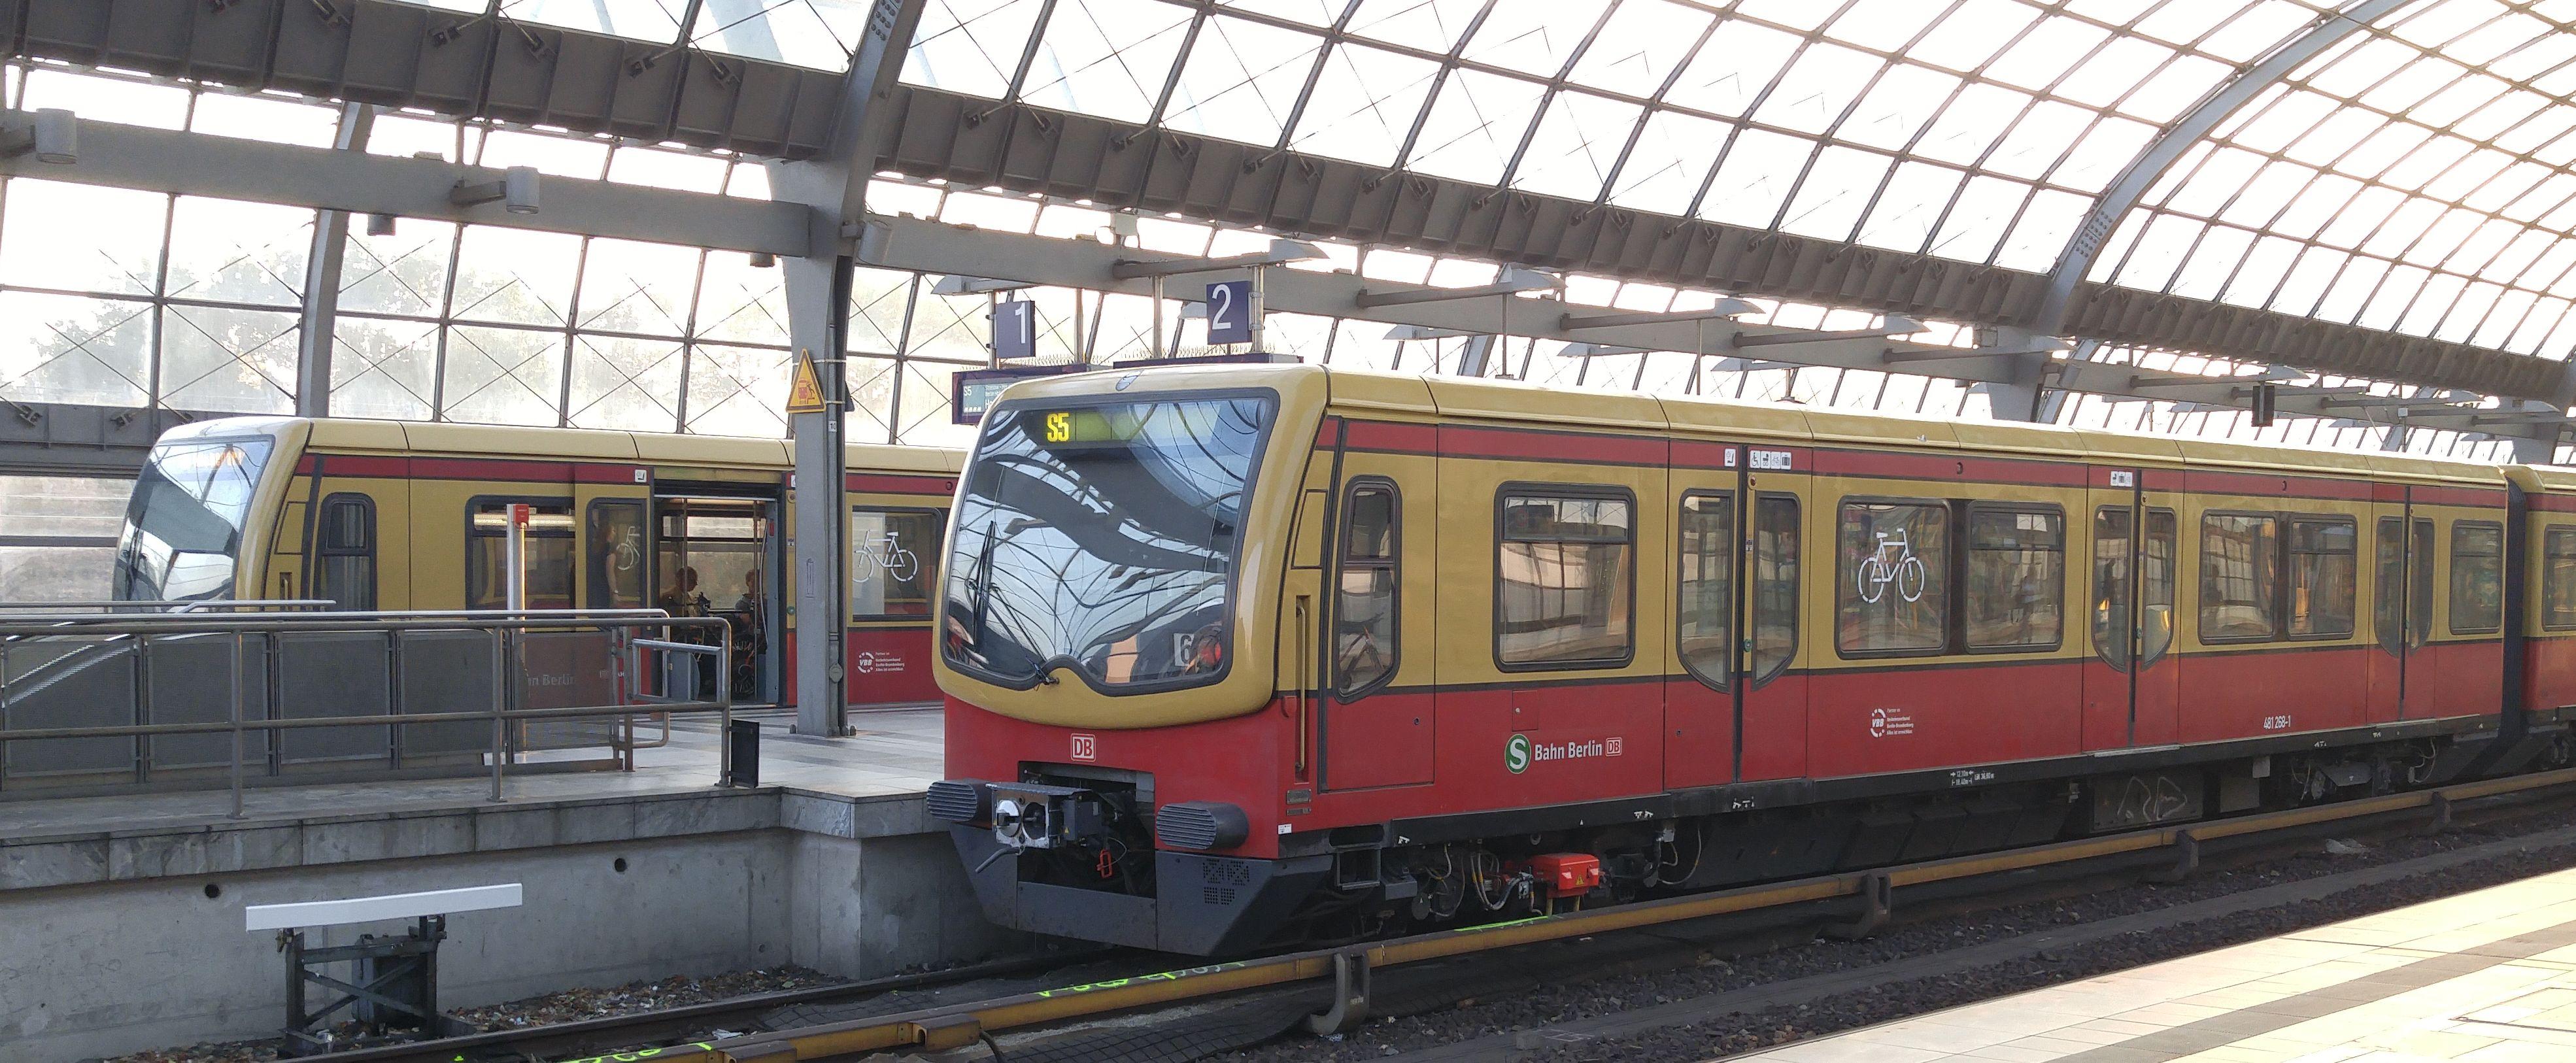 Foto:S-Bahn 481 268, Baureihe481/482, Spandau, 2017